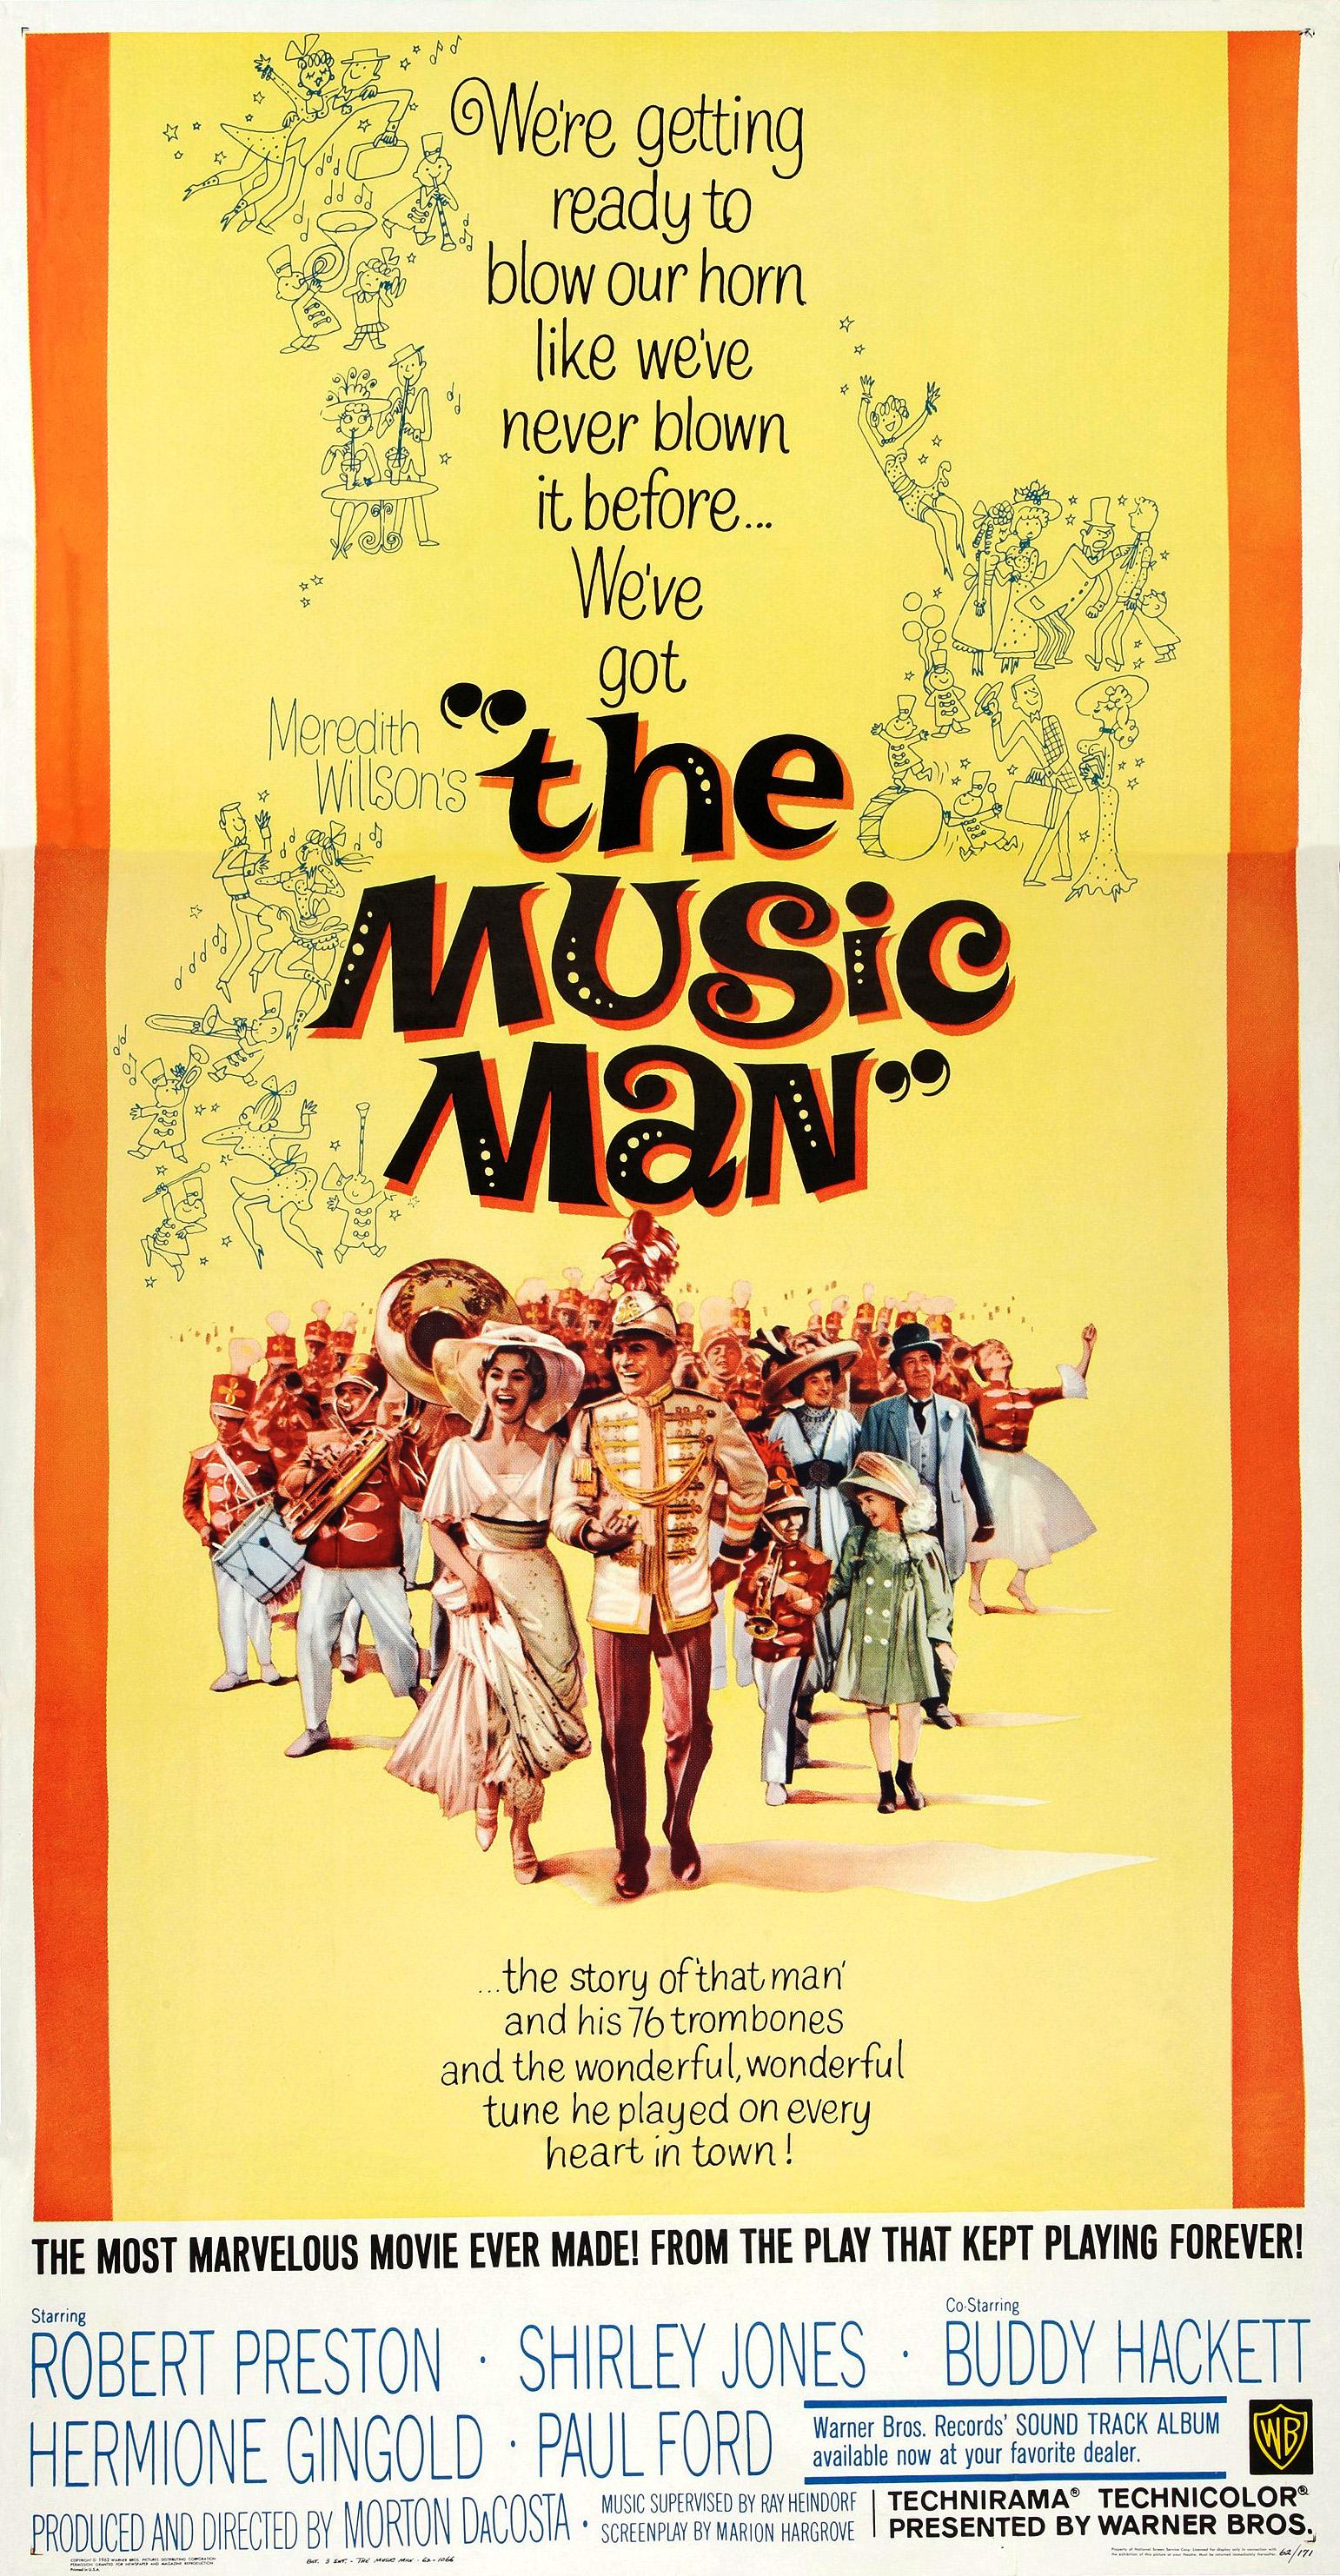 The Music Man (1962 film) - Wikipedia